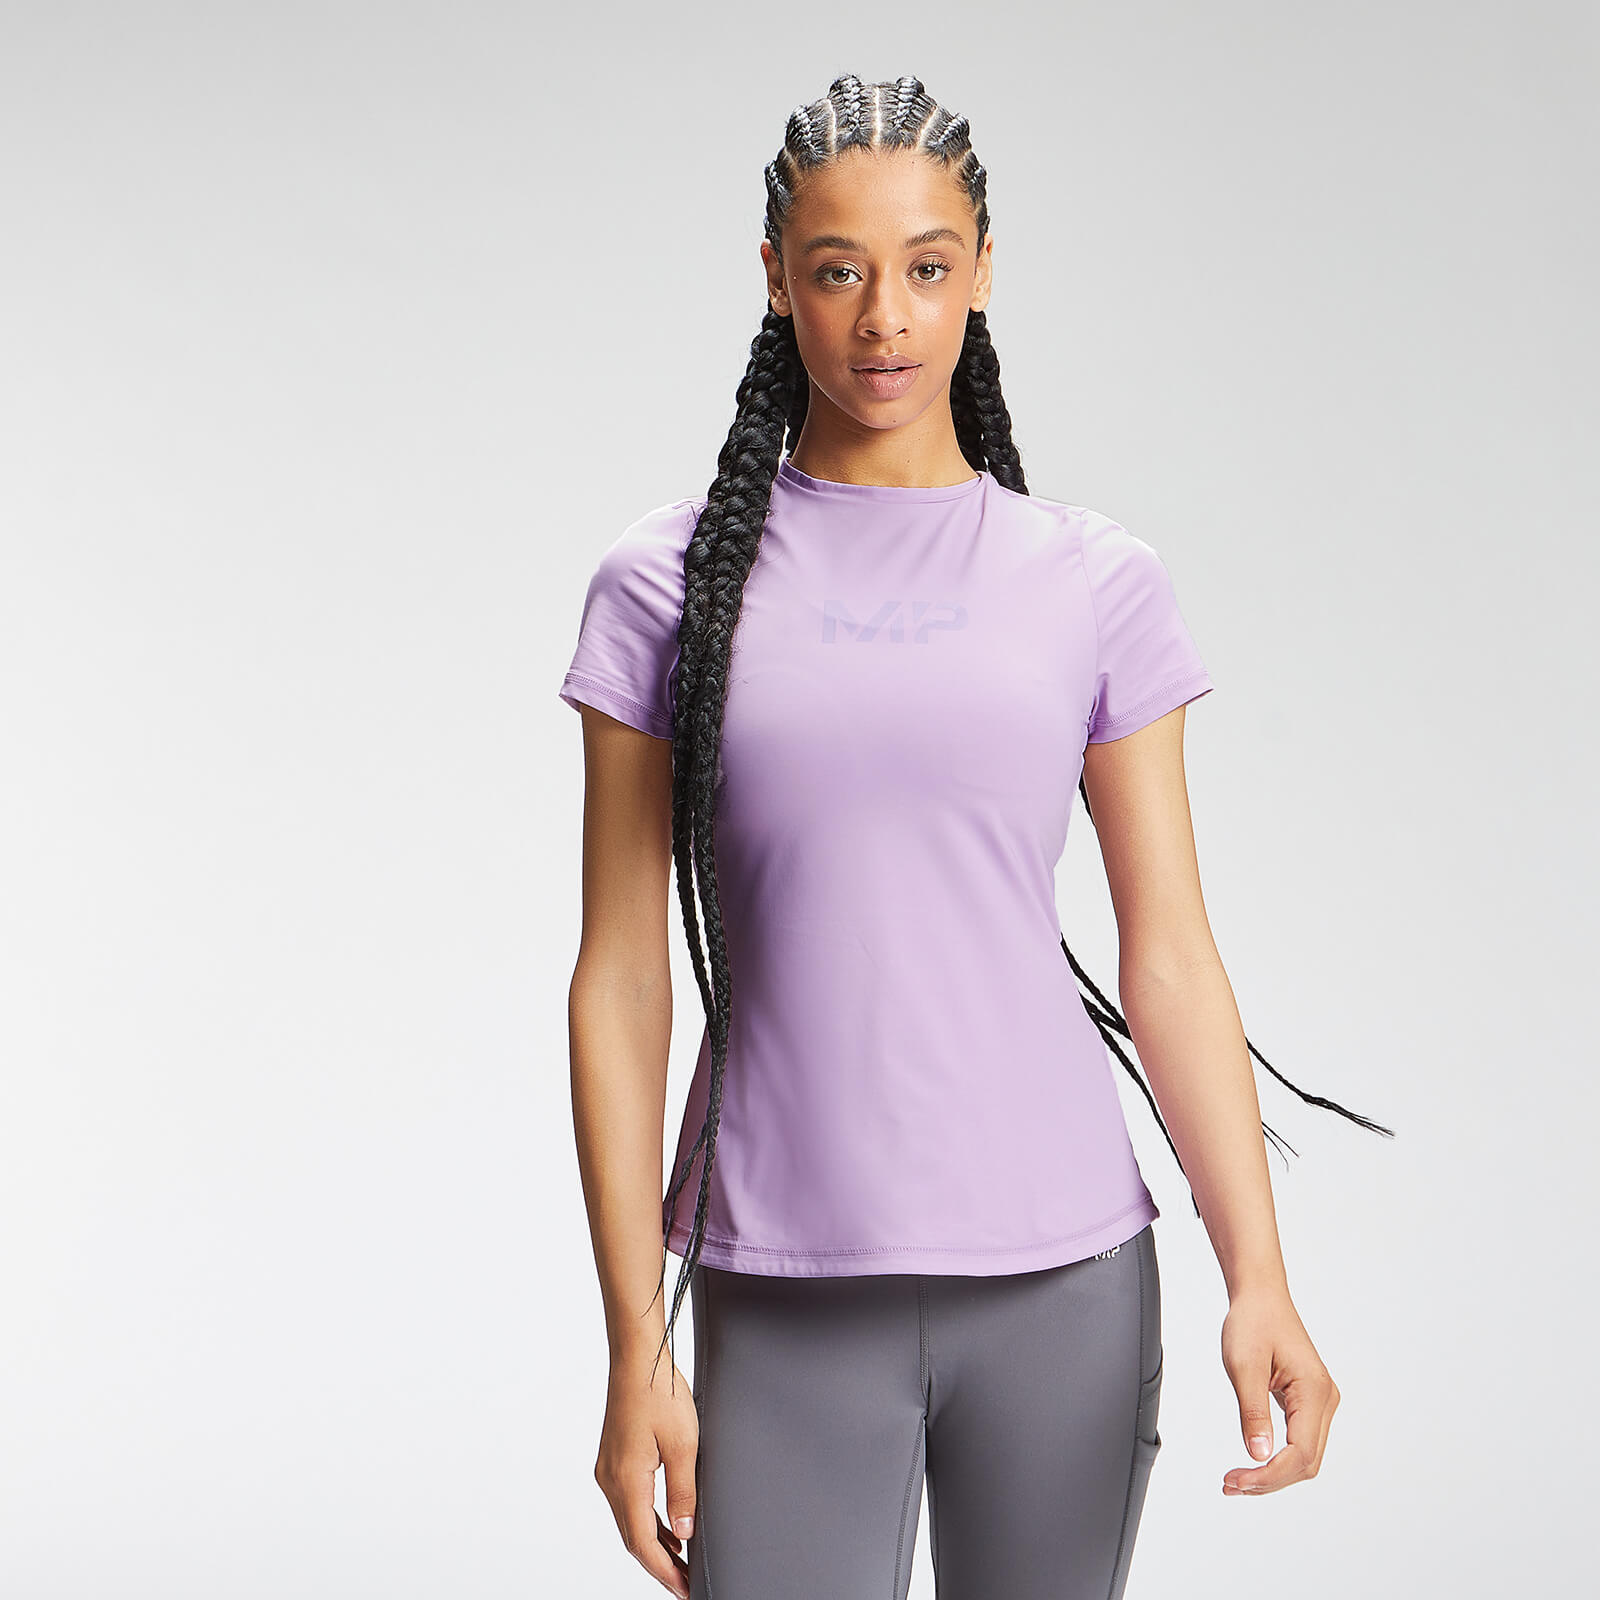 Купить MP Women's Tempo Short Sleeve Top - Powder Purple - XL, Myprotein International